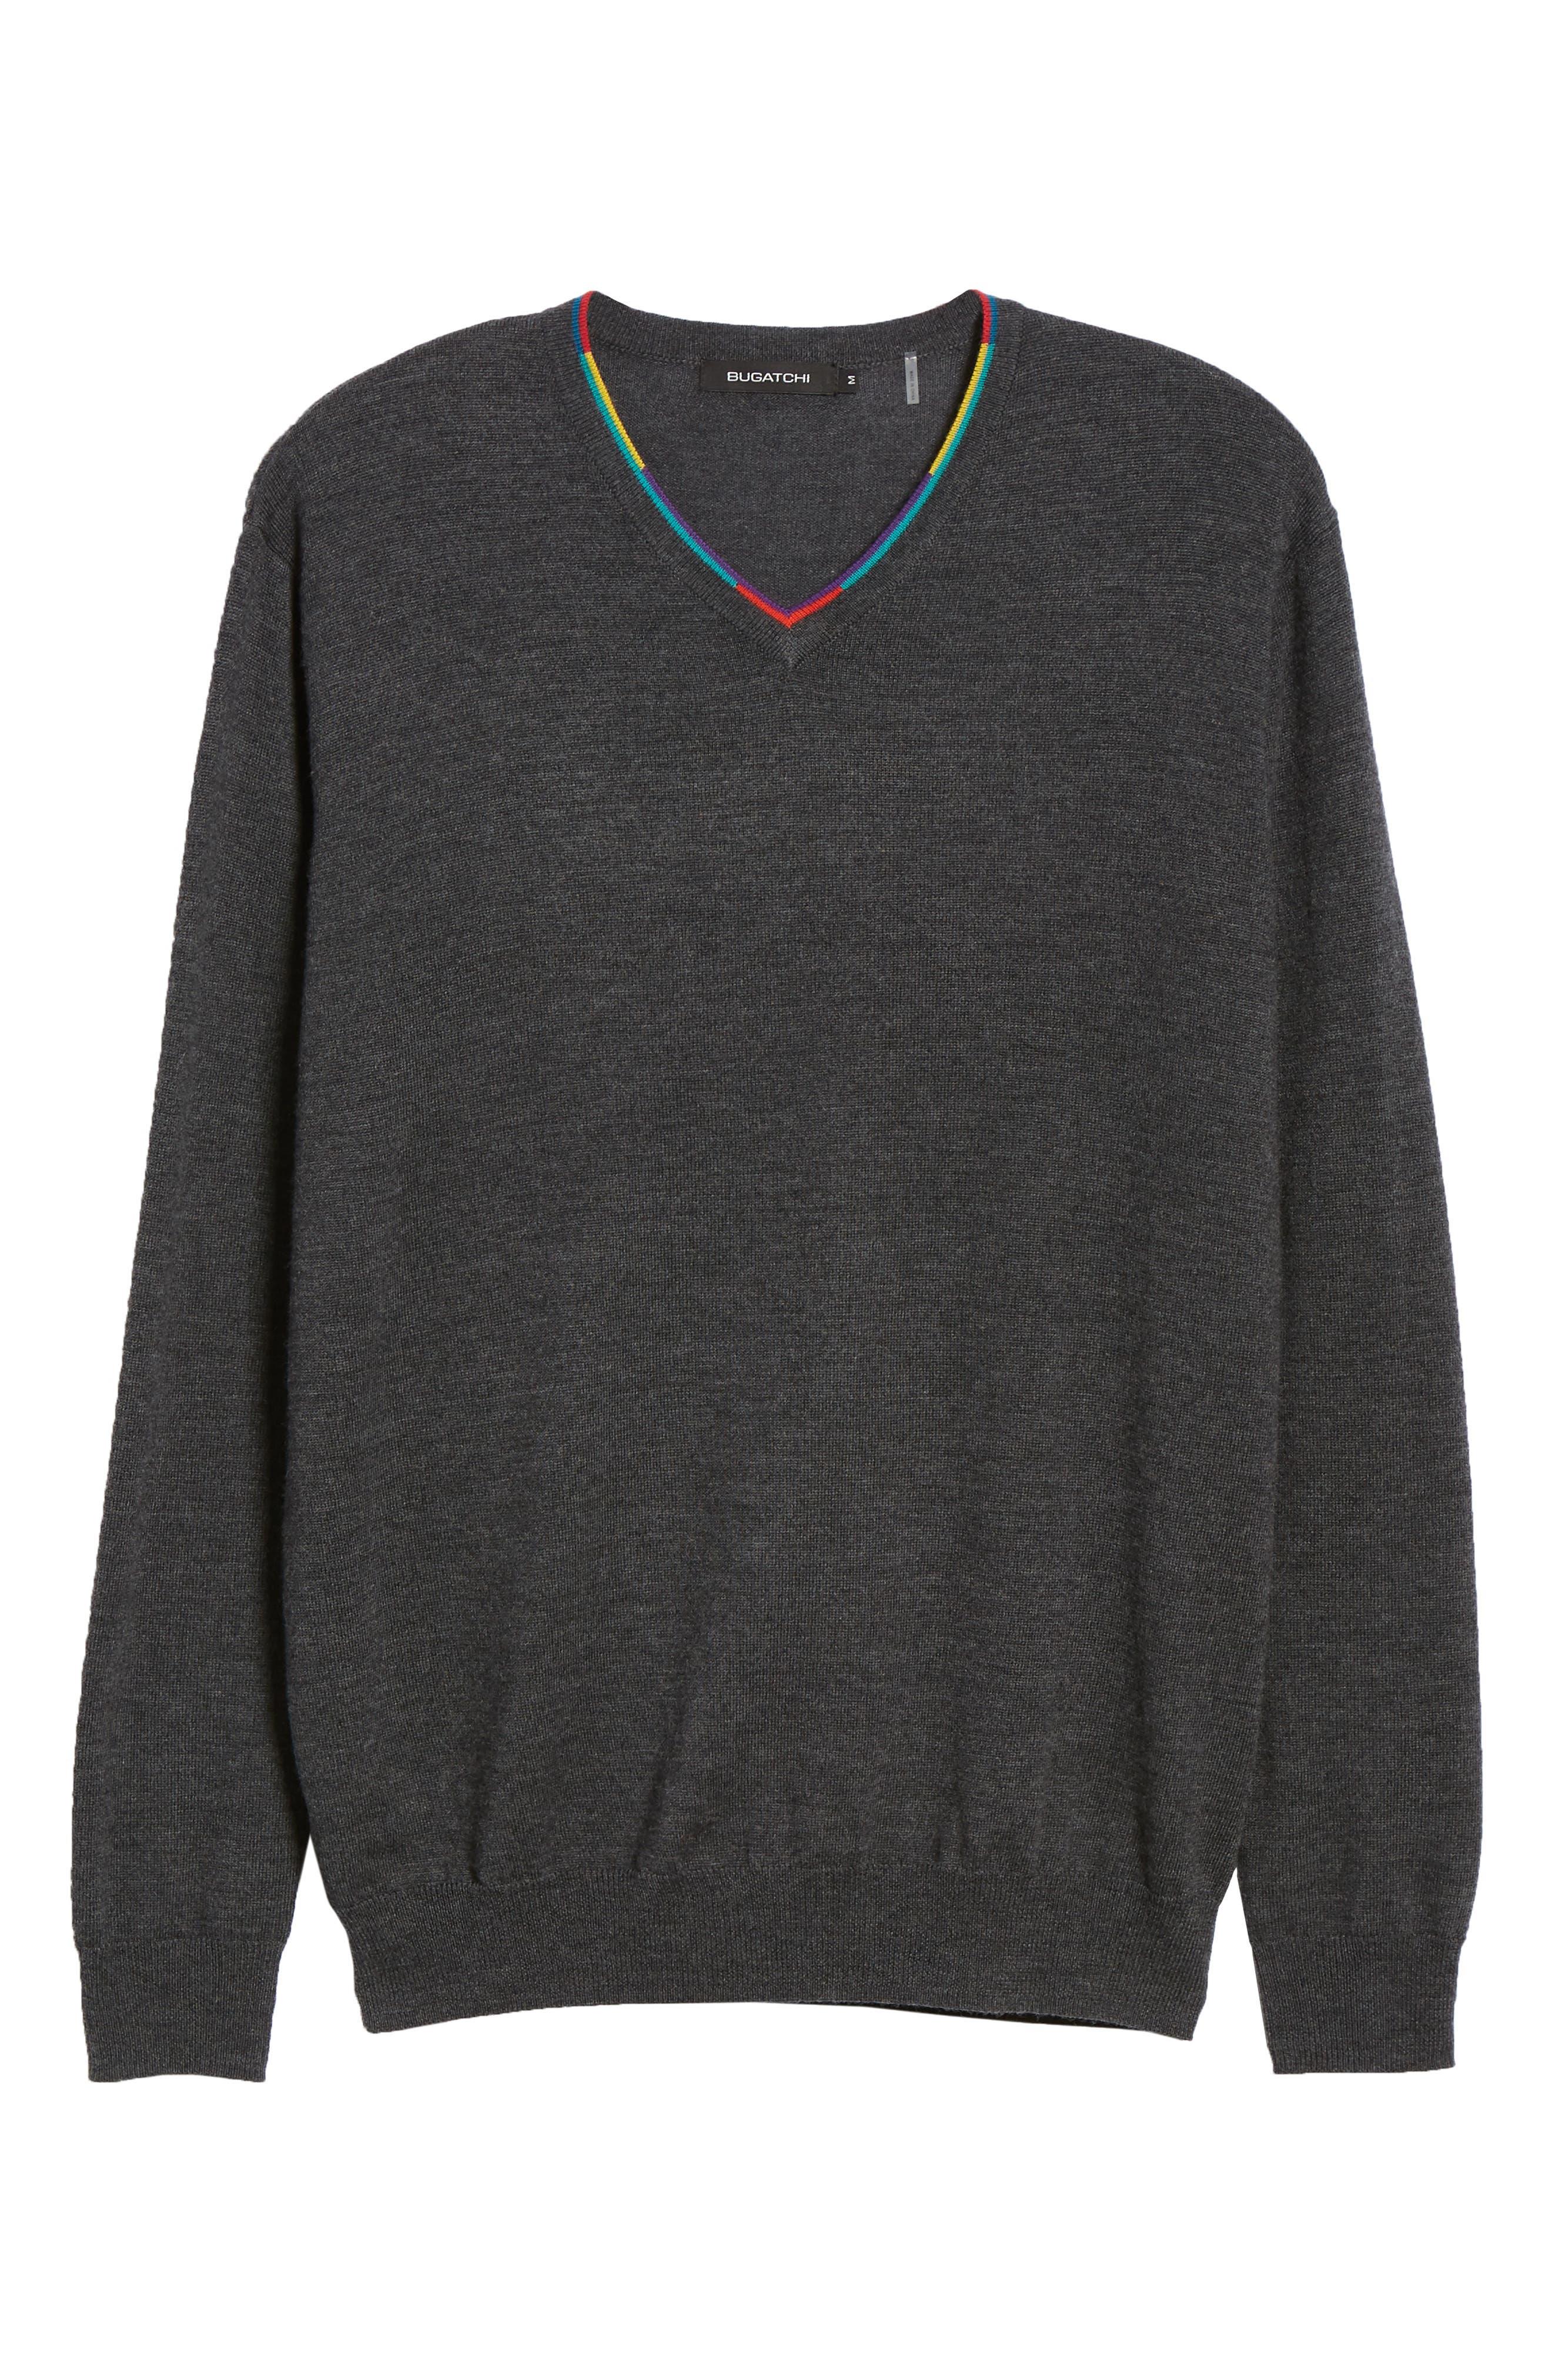 V-Neck Merino Wool Sweater,                             Alternate thumbnail 6, color,                             CHARCOAL